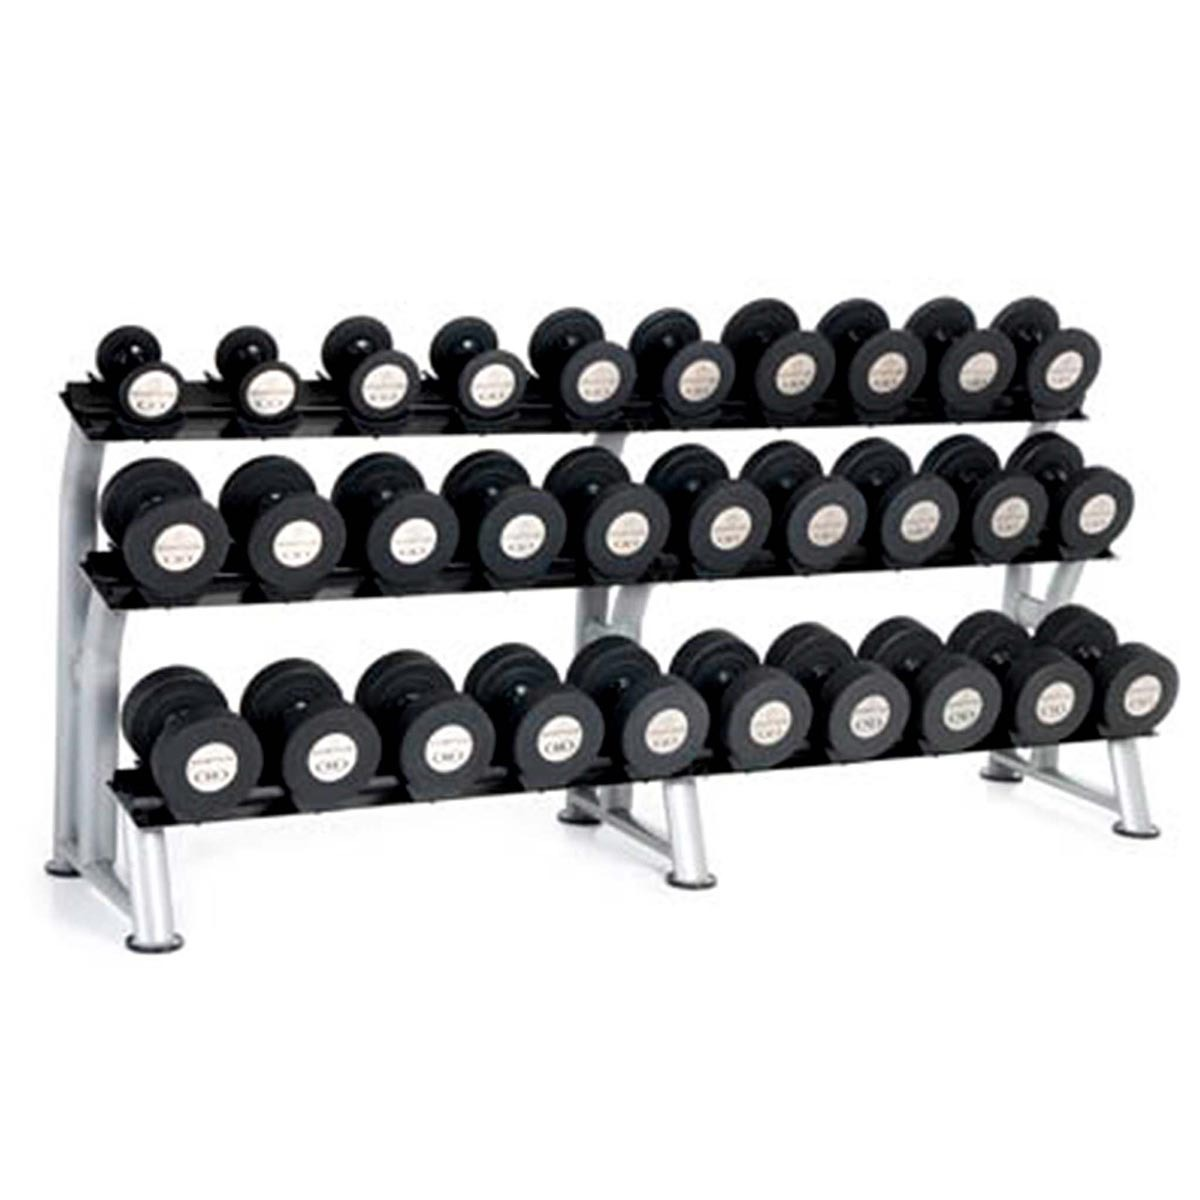 Richmond Free Weights - Hampton Gel Grips - Lifestyle Equipment